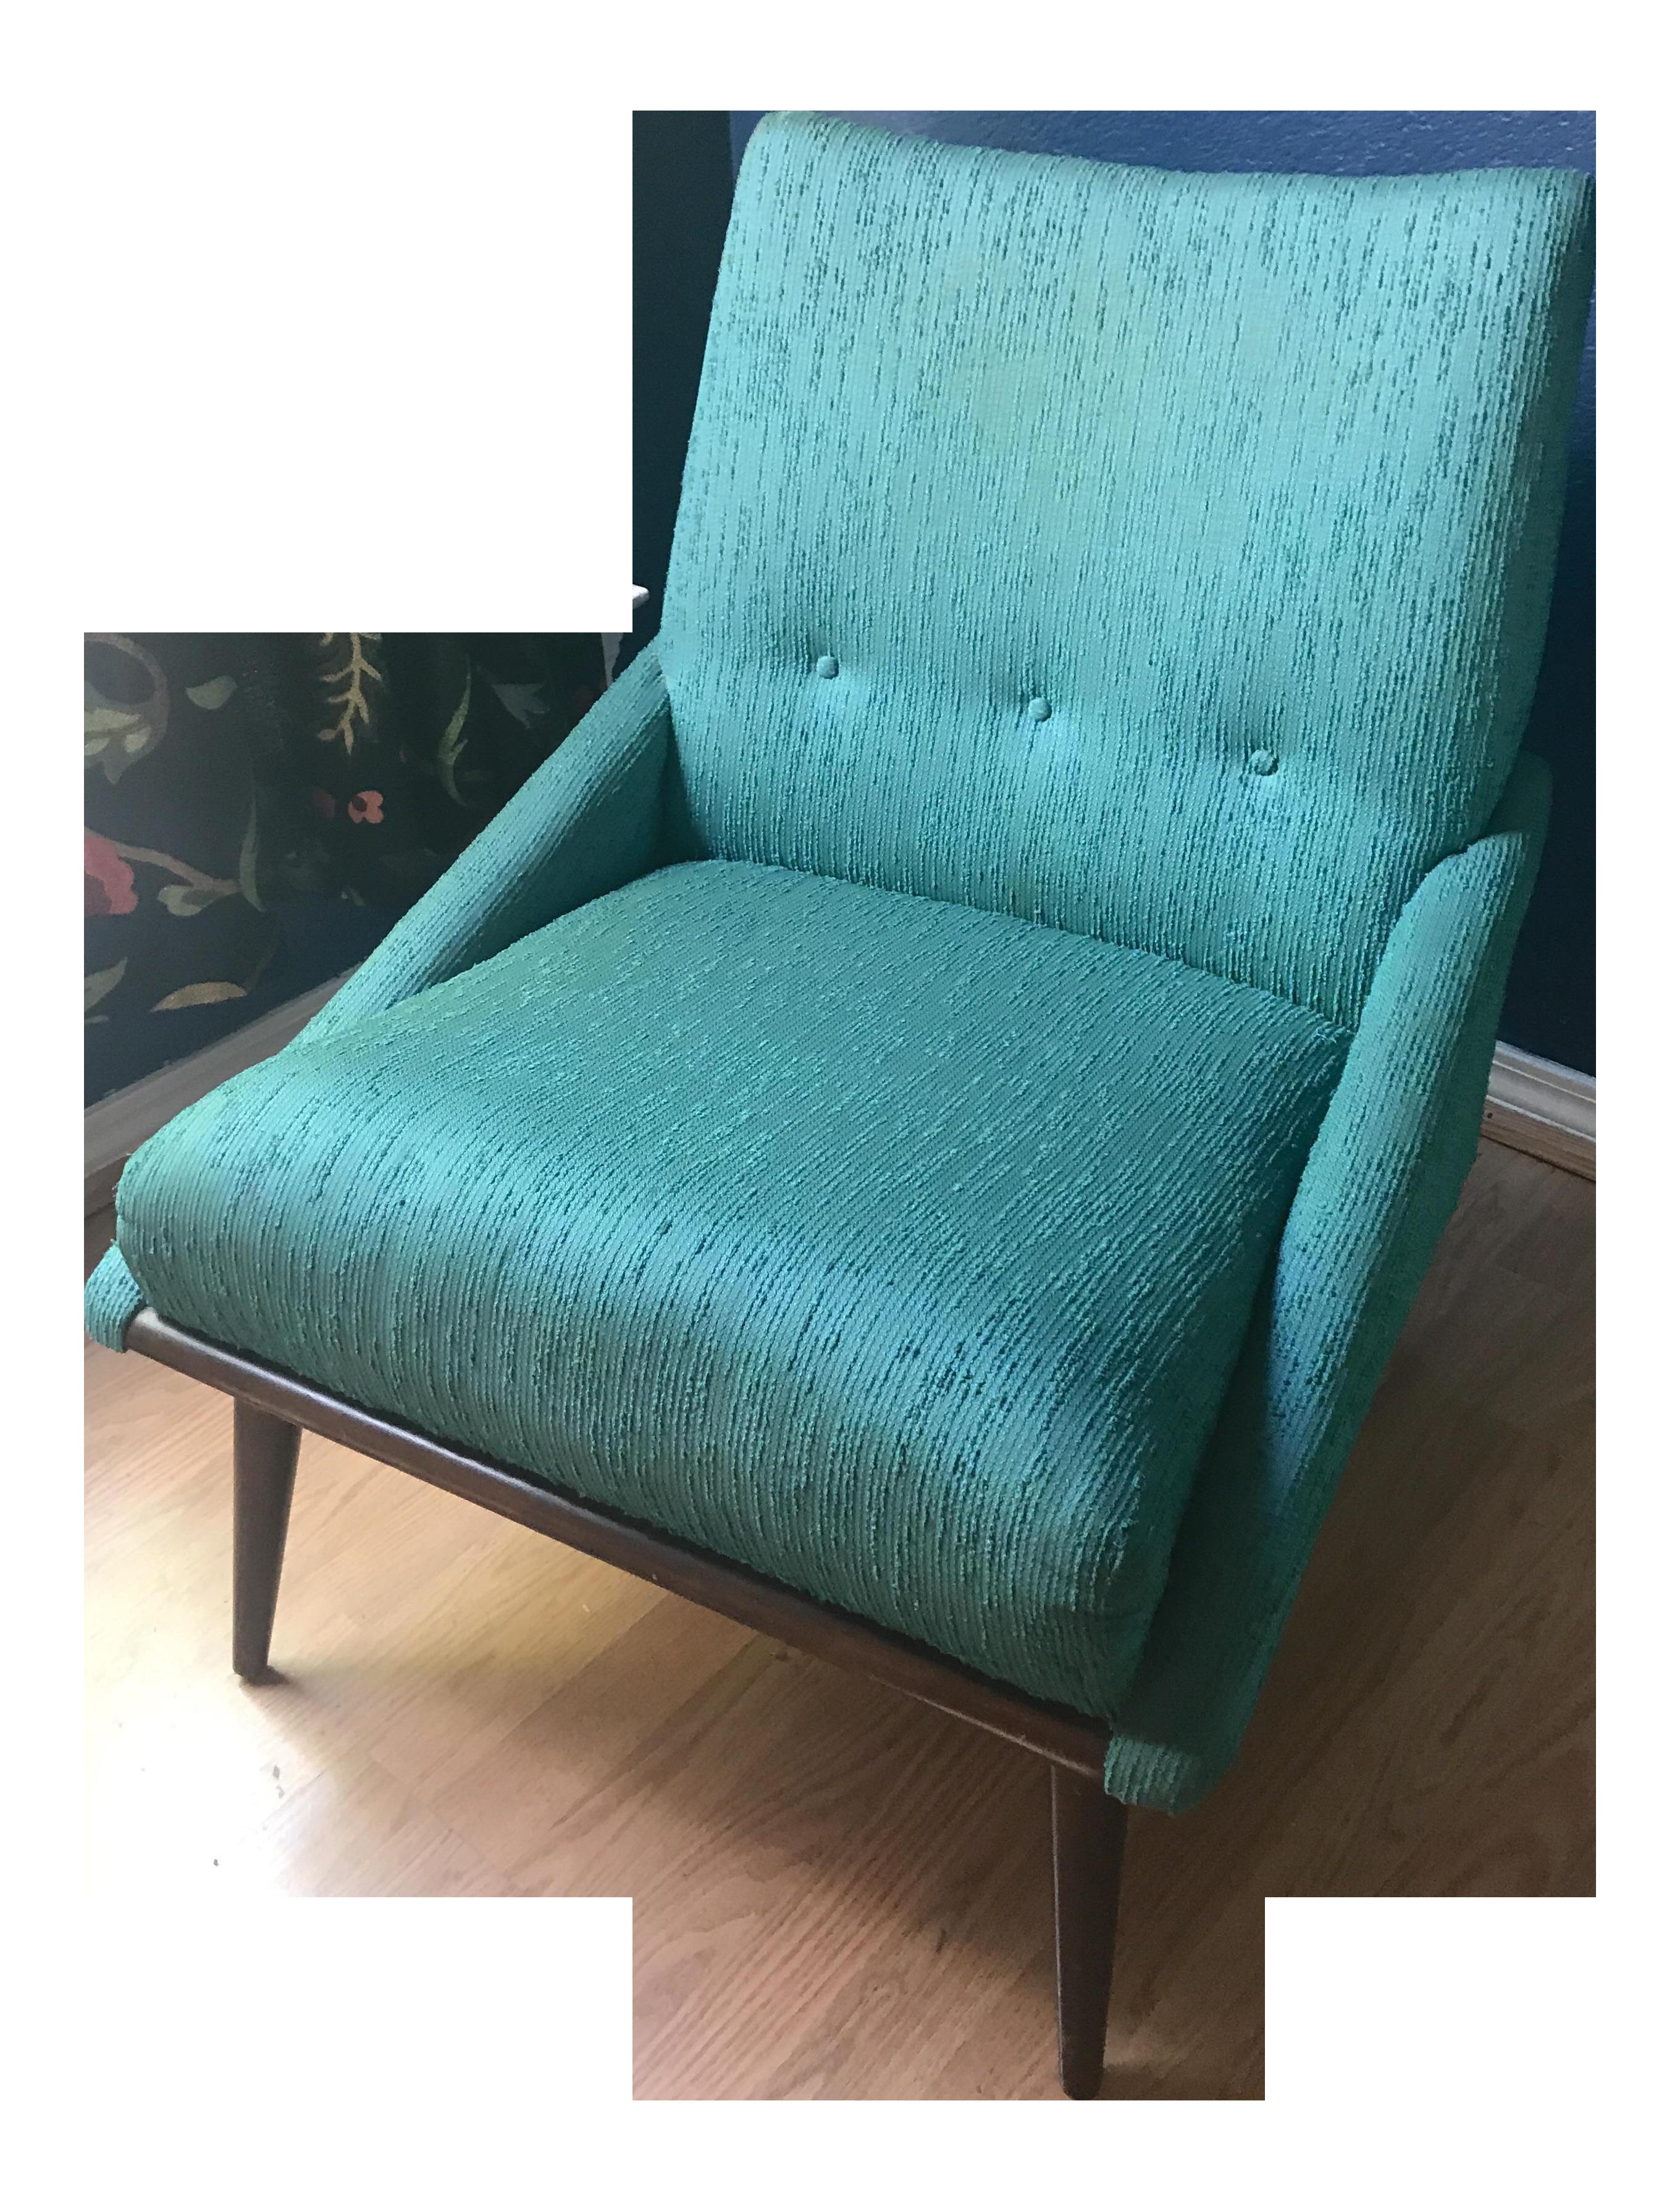 Teal Kroehler Slipper Chair